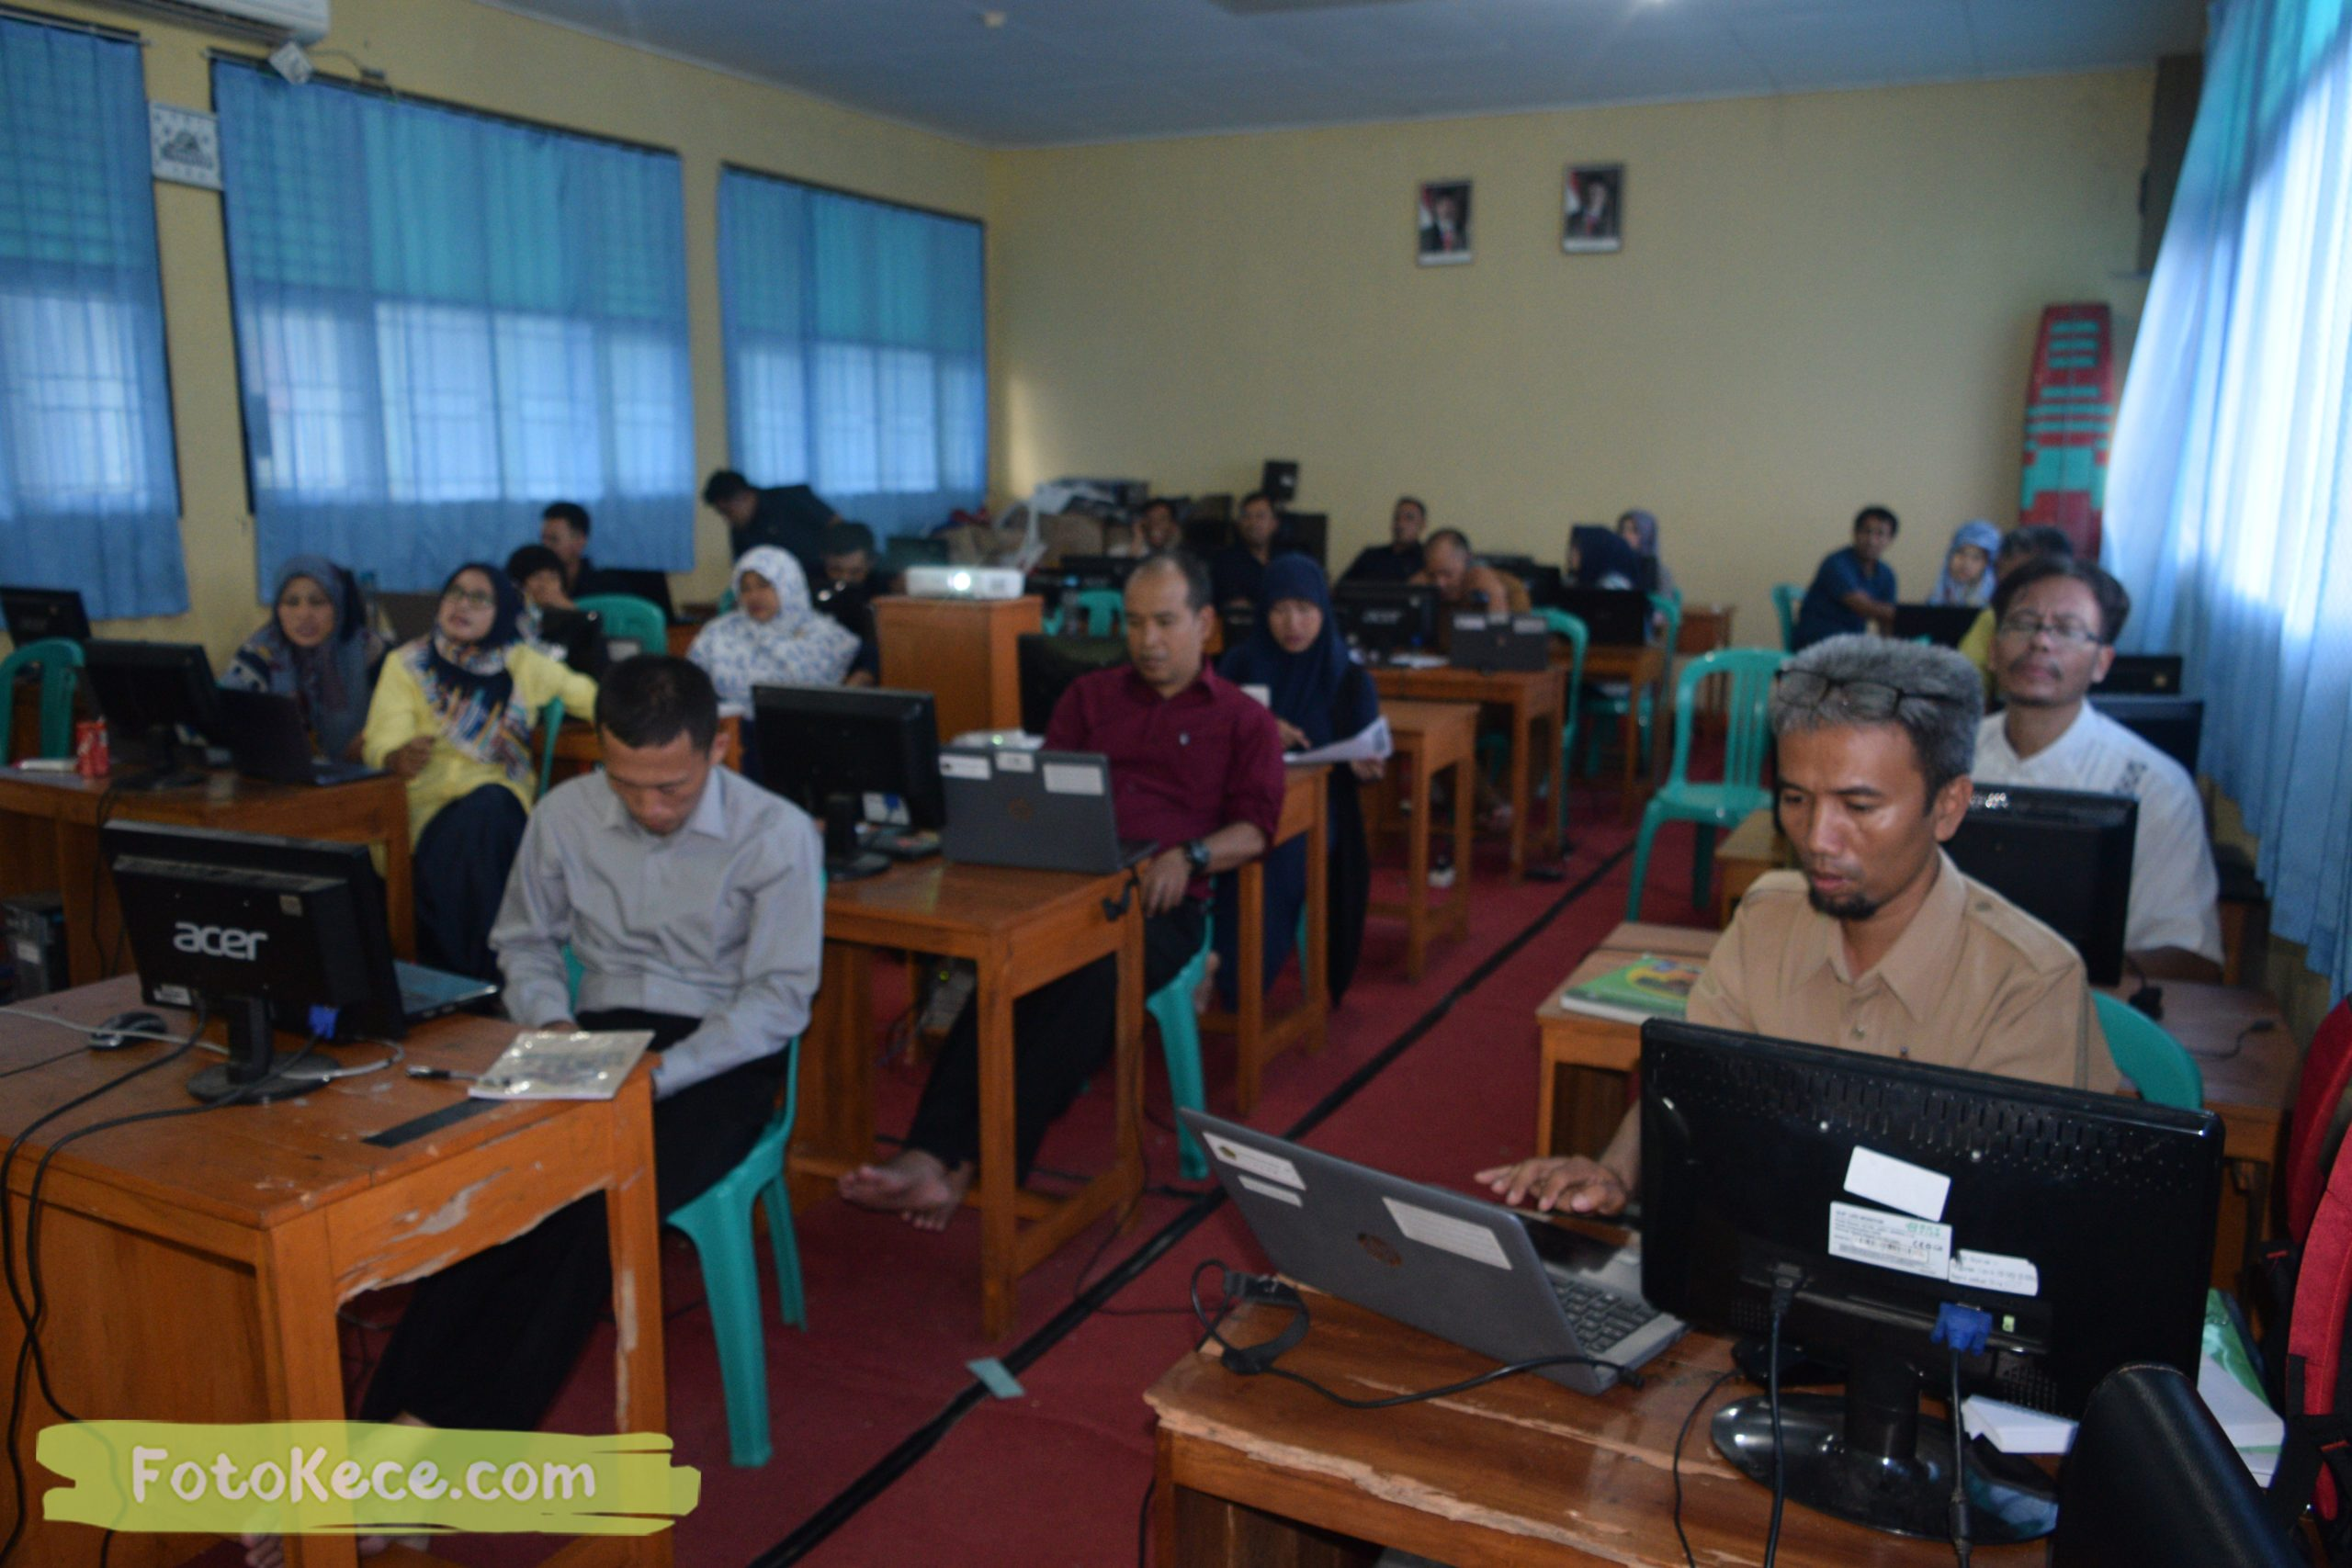 bimbingan teknis sieka 2020 bersama Bpk Abdul Aziz 08012020 fotokece 31 scaled